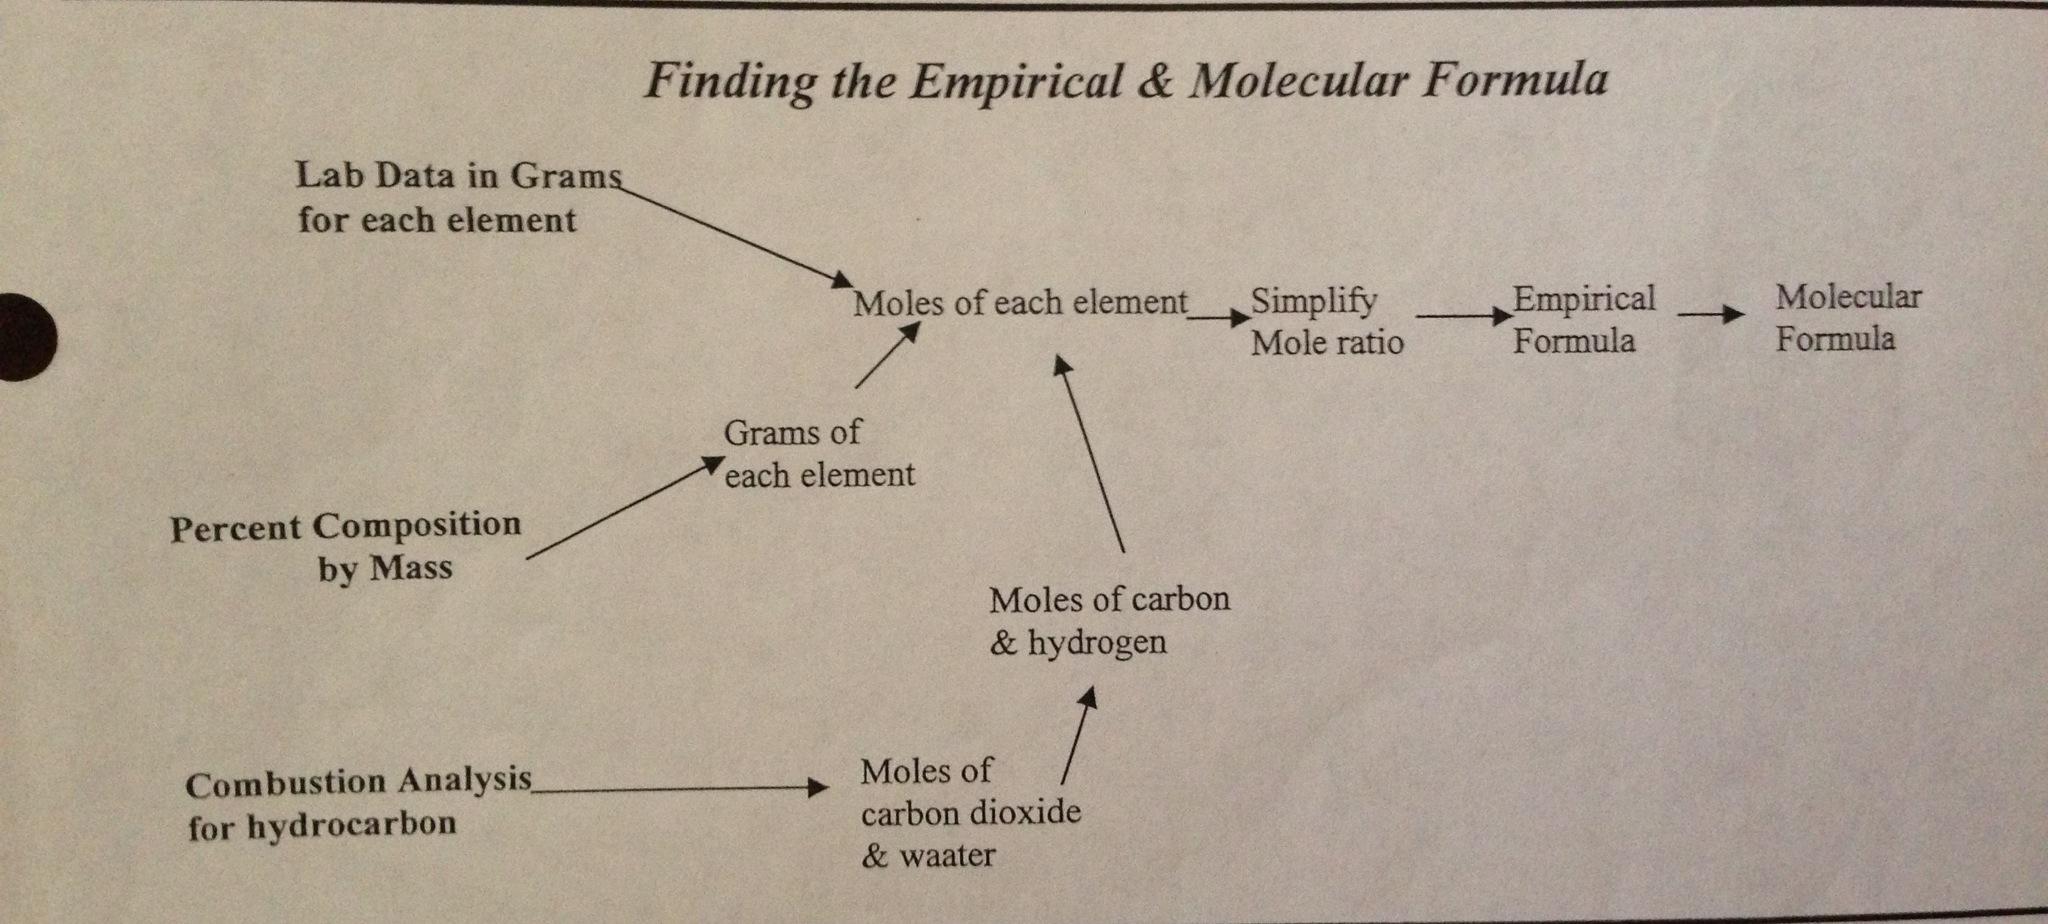 Finding The Empirical And Molecular Formula